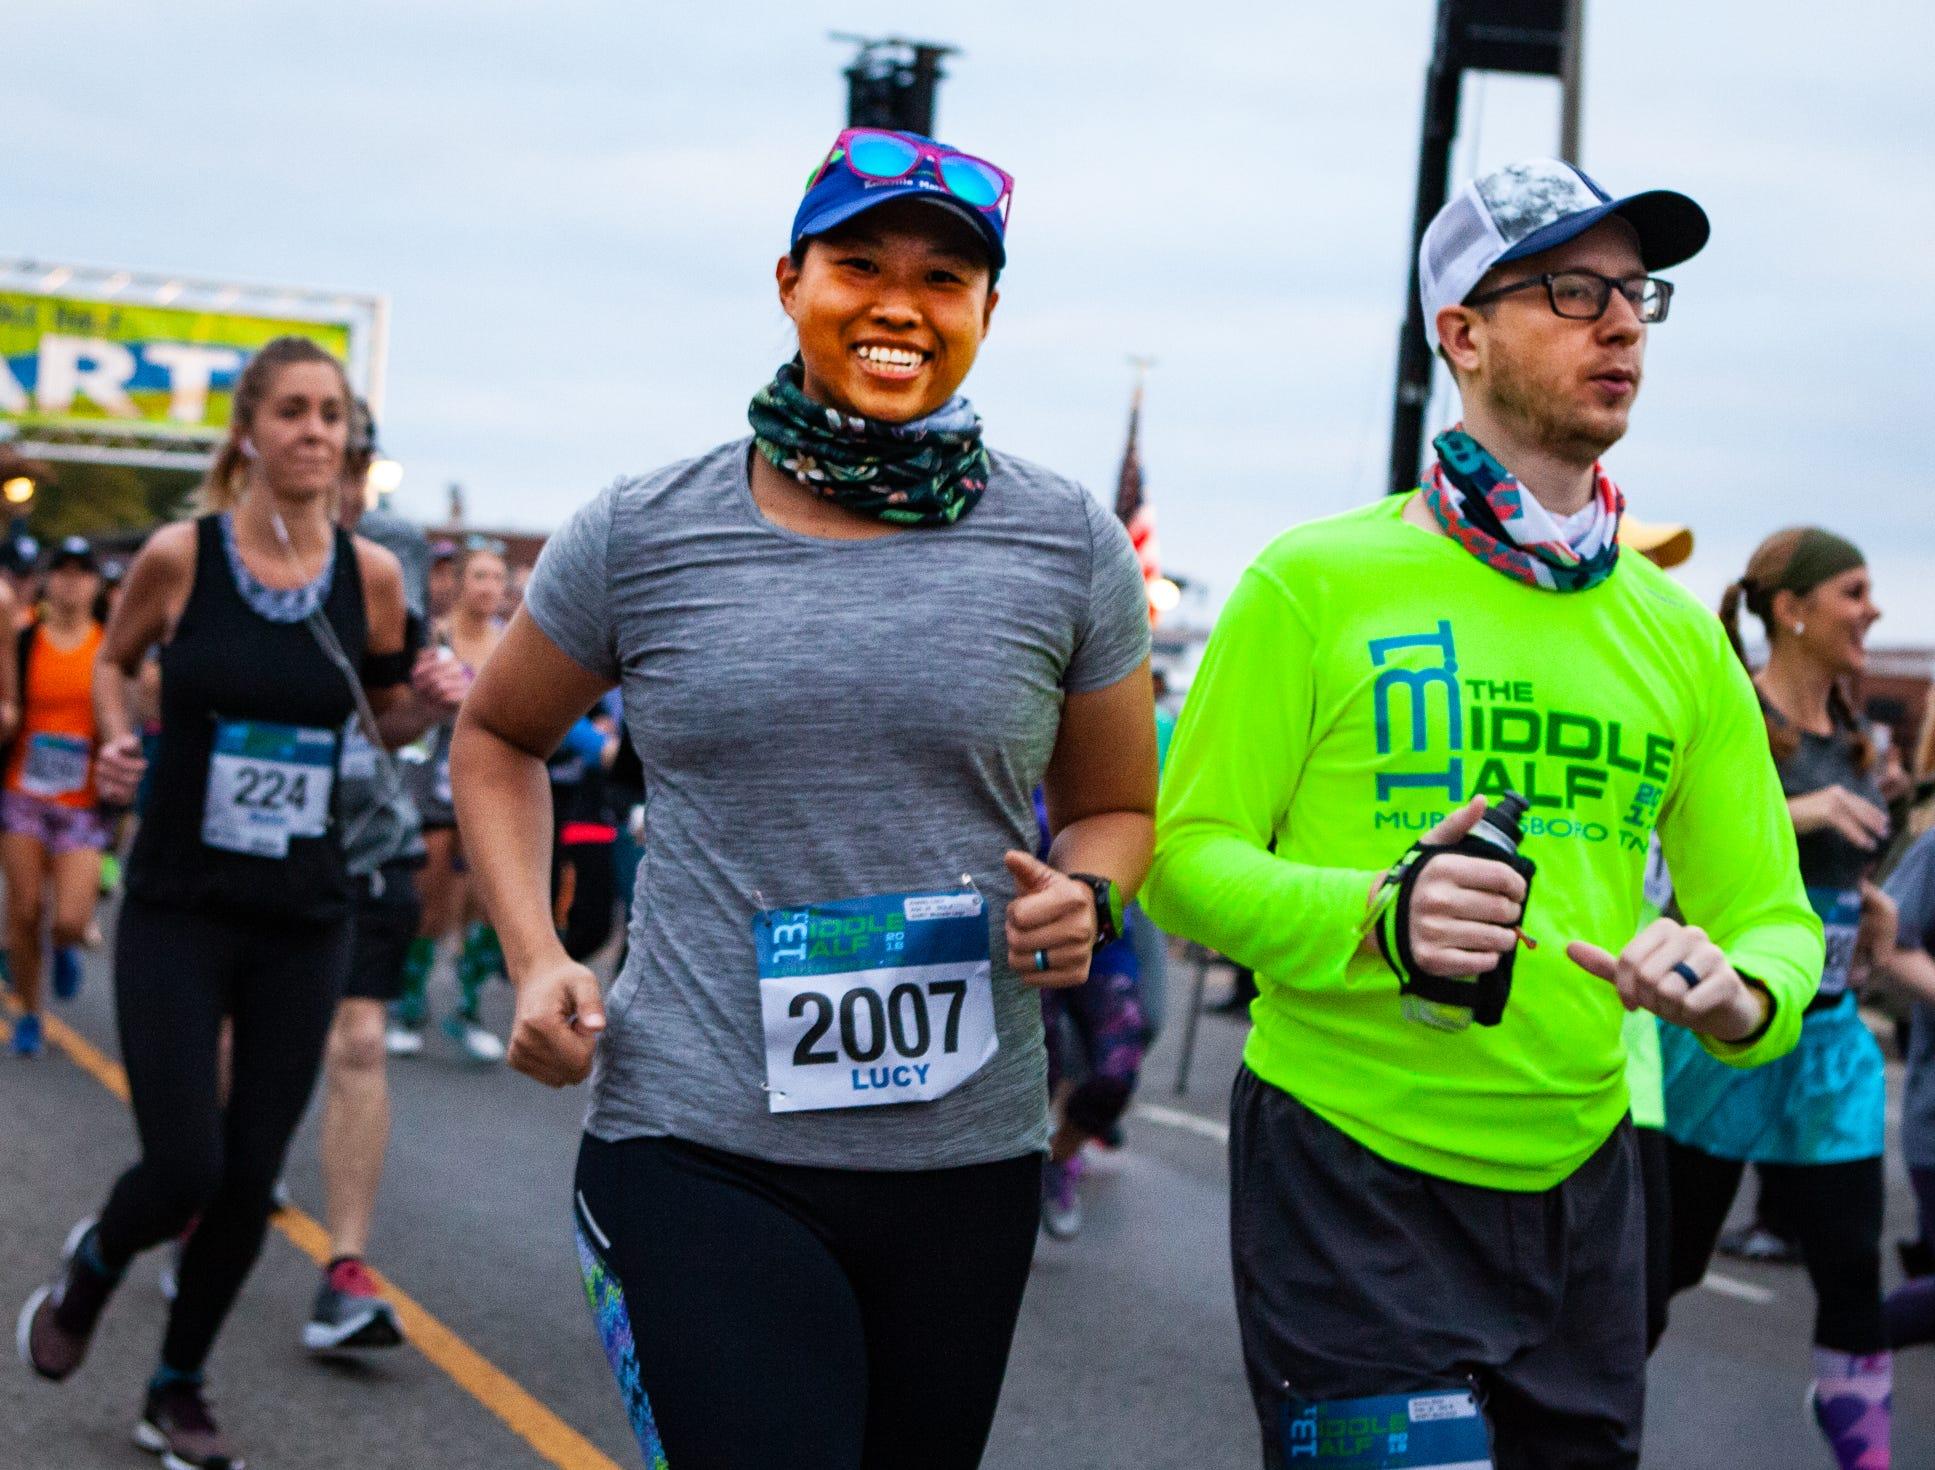 The 12th annual Murfreesboro Half Marathon, also known as The Middle Half, was held Saturday, Oct. 13, 2018